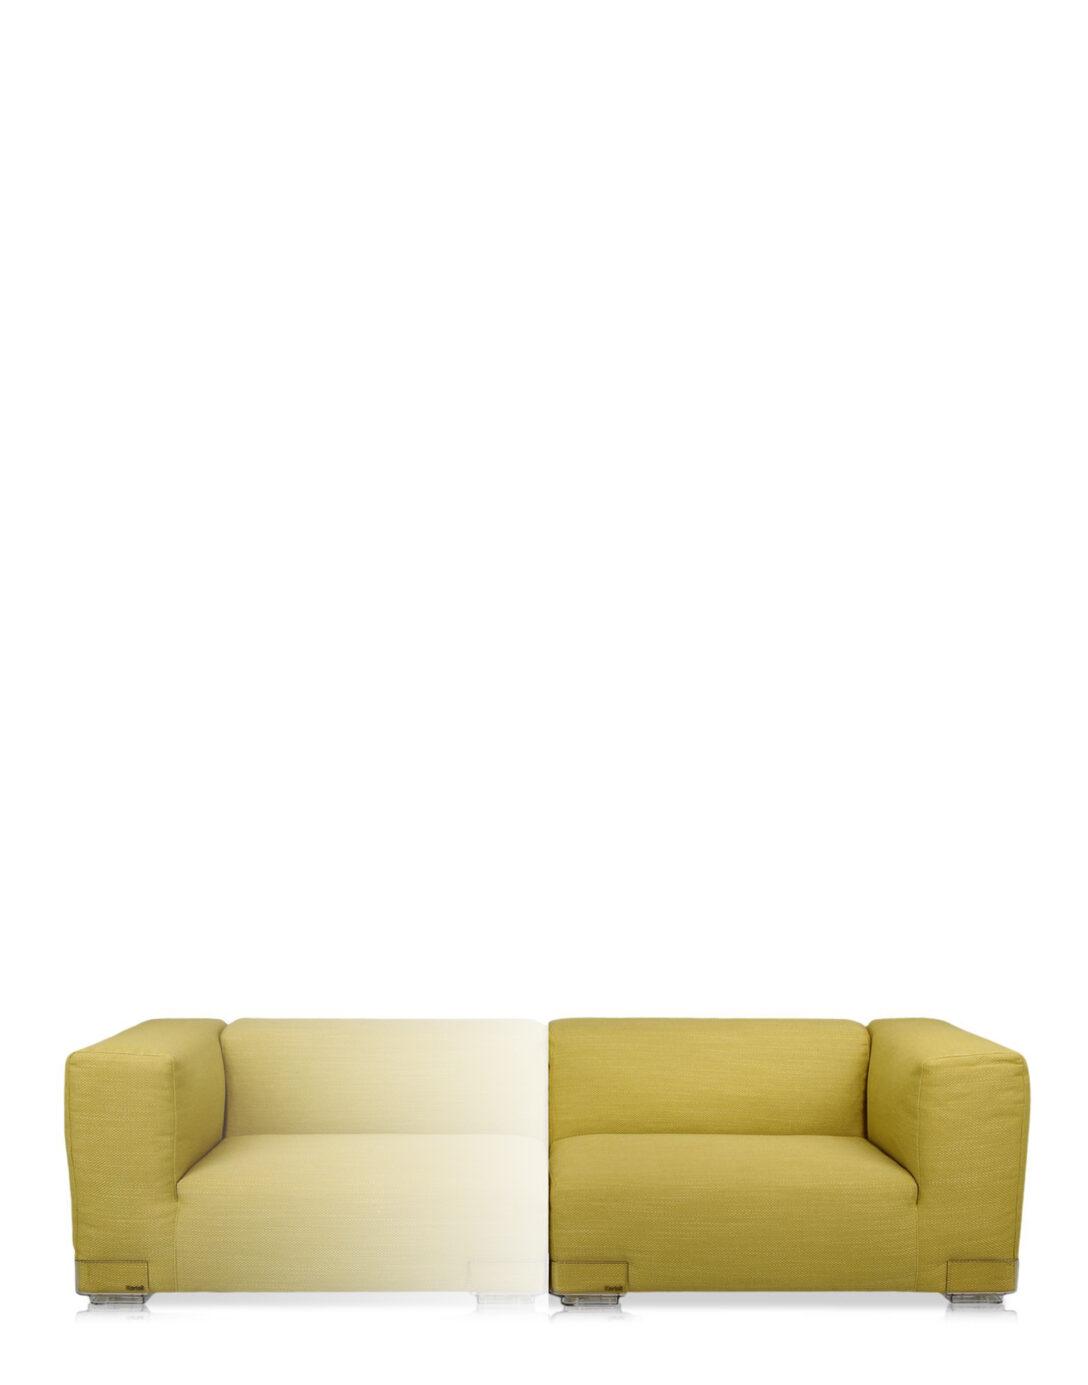 Large Size of Kartell Flagship Store Plastics Duo Sofa 114 Cm Armlehne Spannbezug Benz Tom Tailor U Form Xxl Schlafsofa Liegefläche 160x200 Landhaus Brühl Angebote Big Sofa Sofa Grün